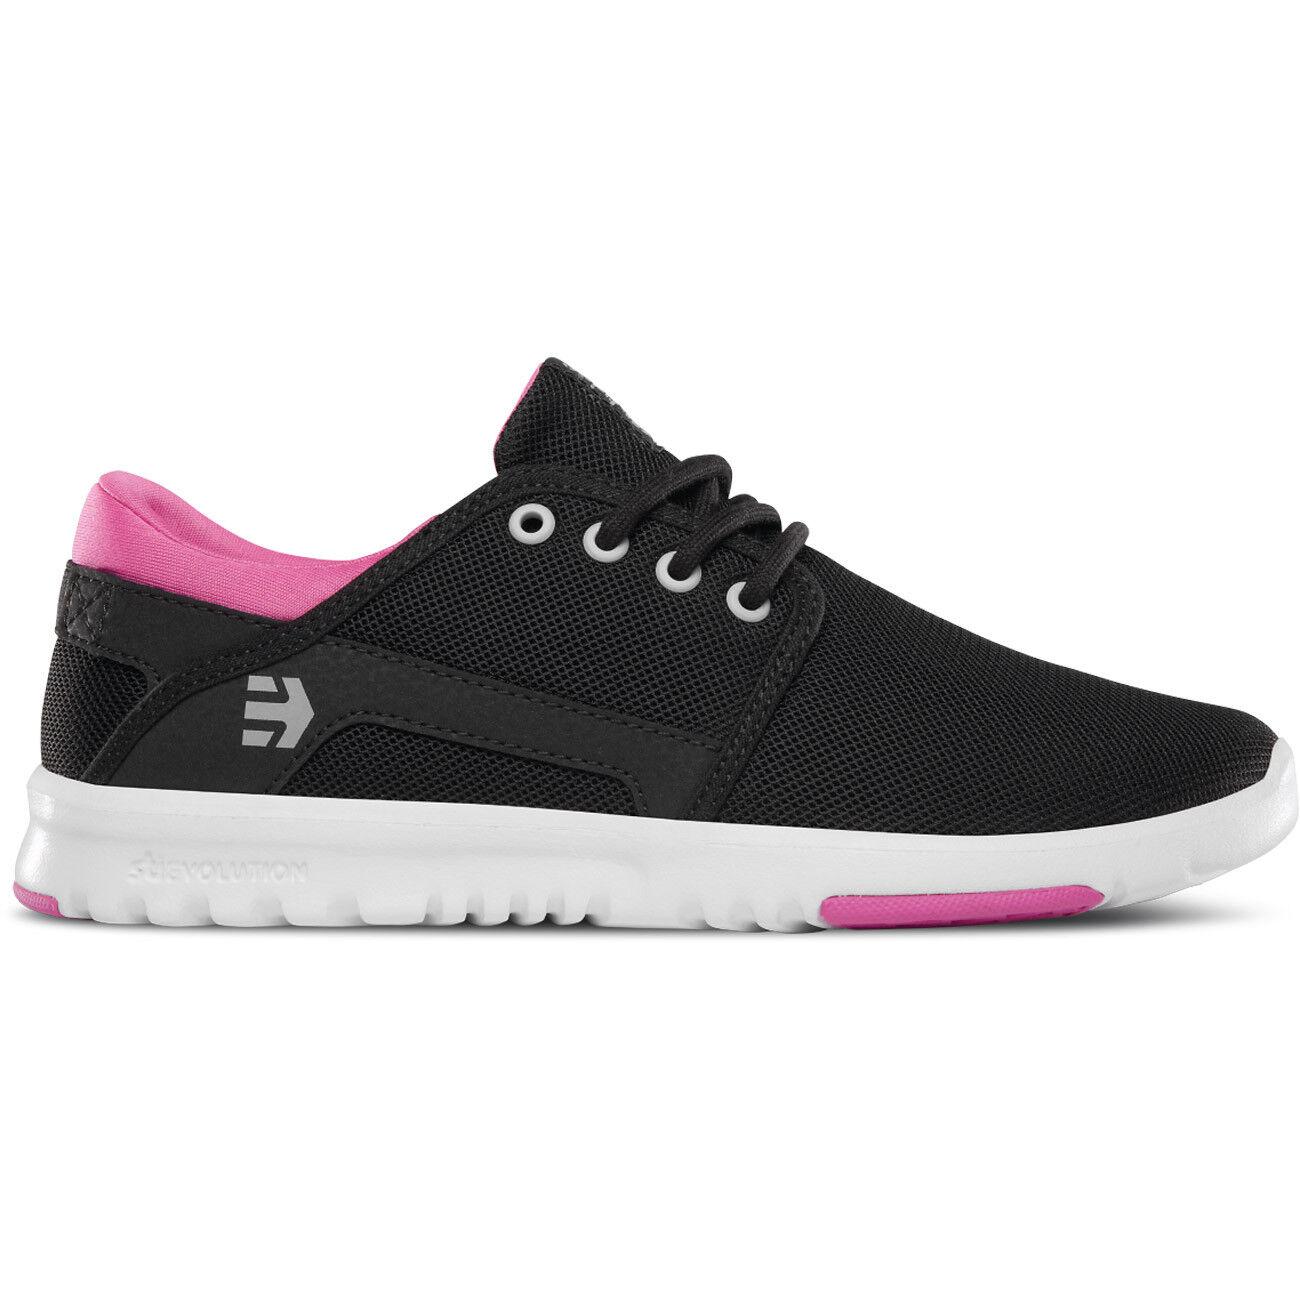 Etnies Damen Sneaker SCOUT W'S - BLACK/PINK/PINK